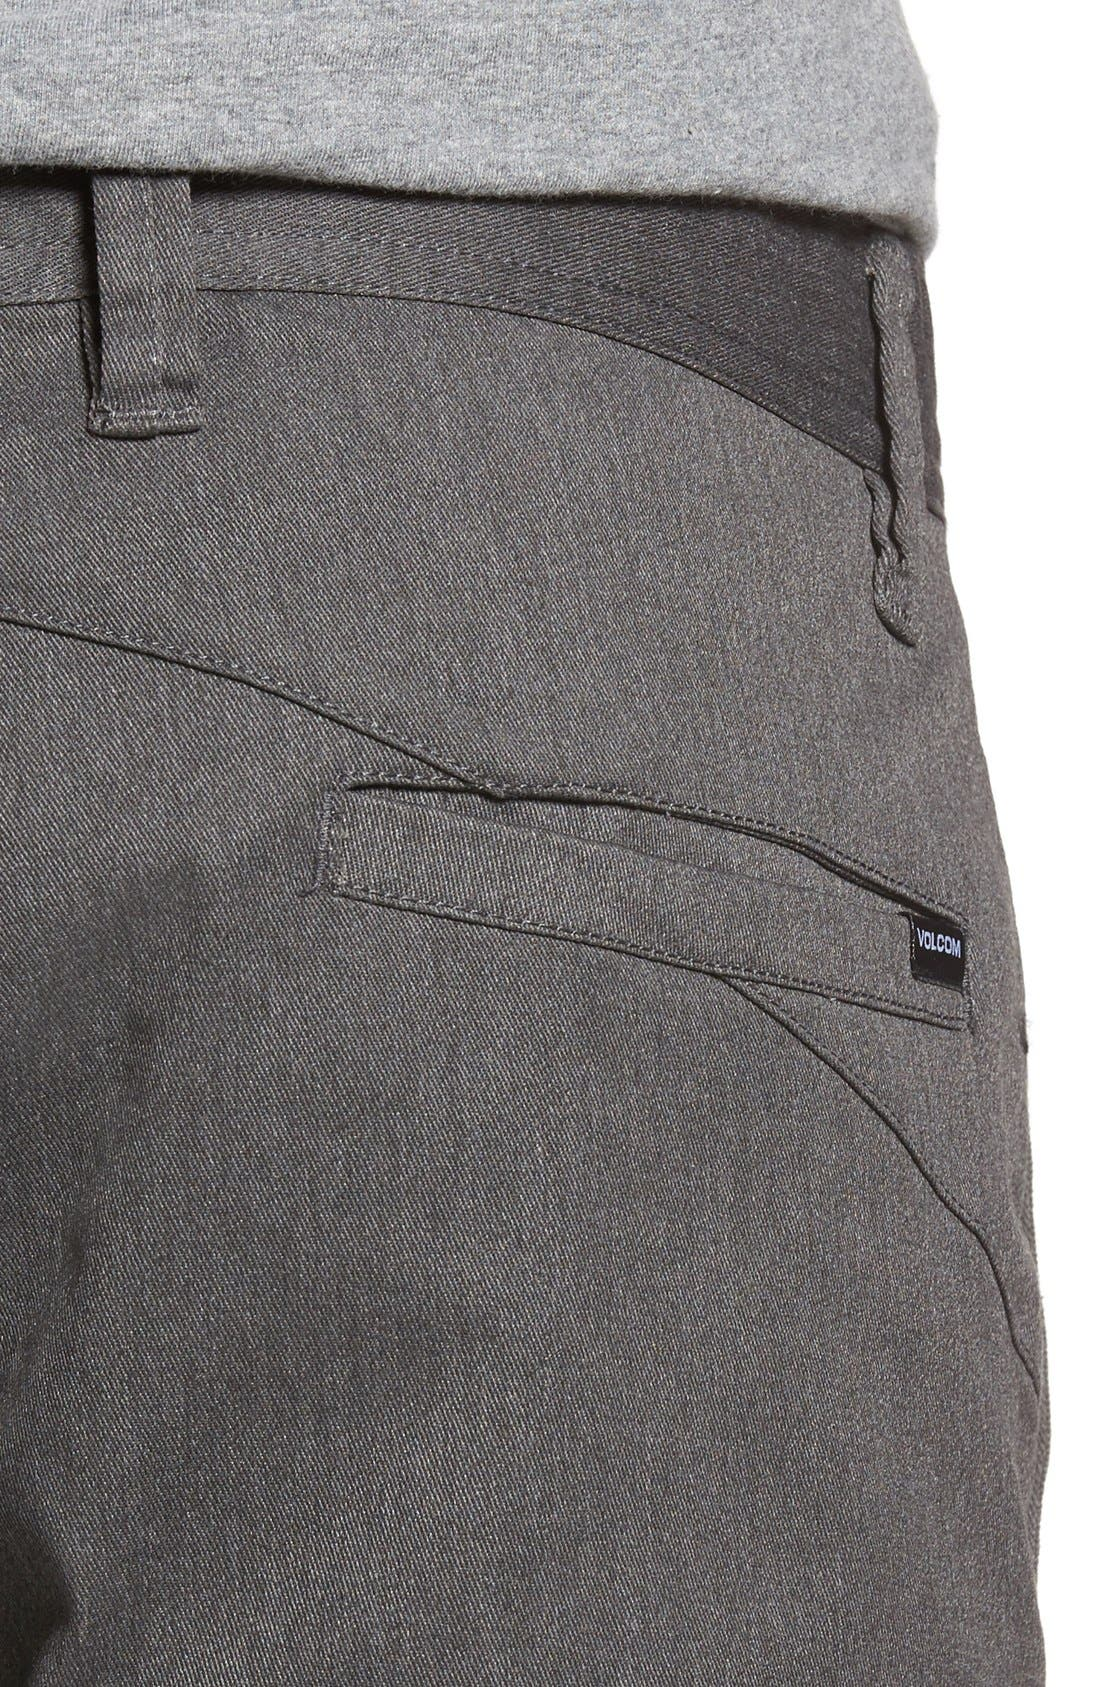 'Modern' Stretch Chino Shorts,                             Alternate thumbnail 4, color,                             030